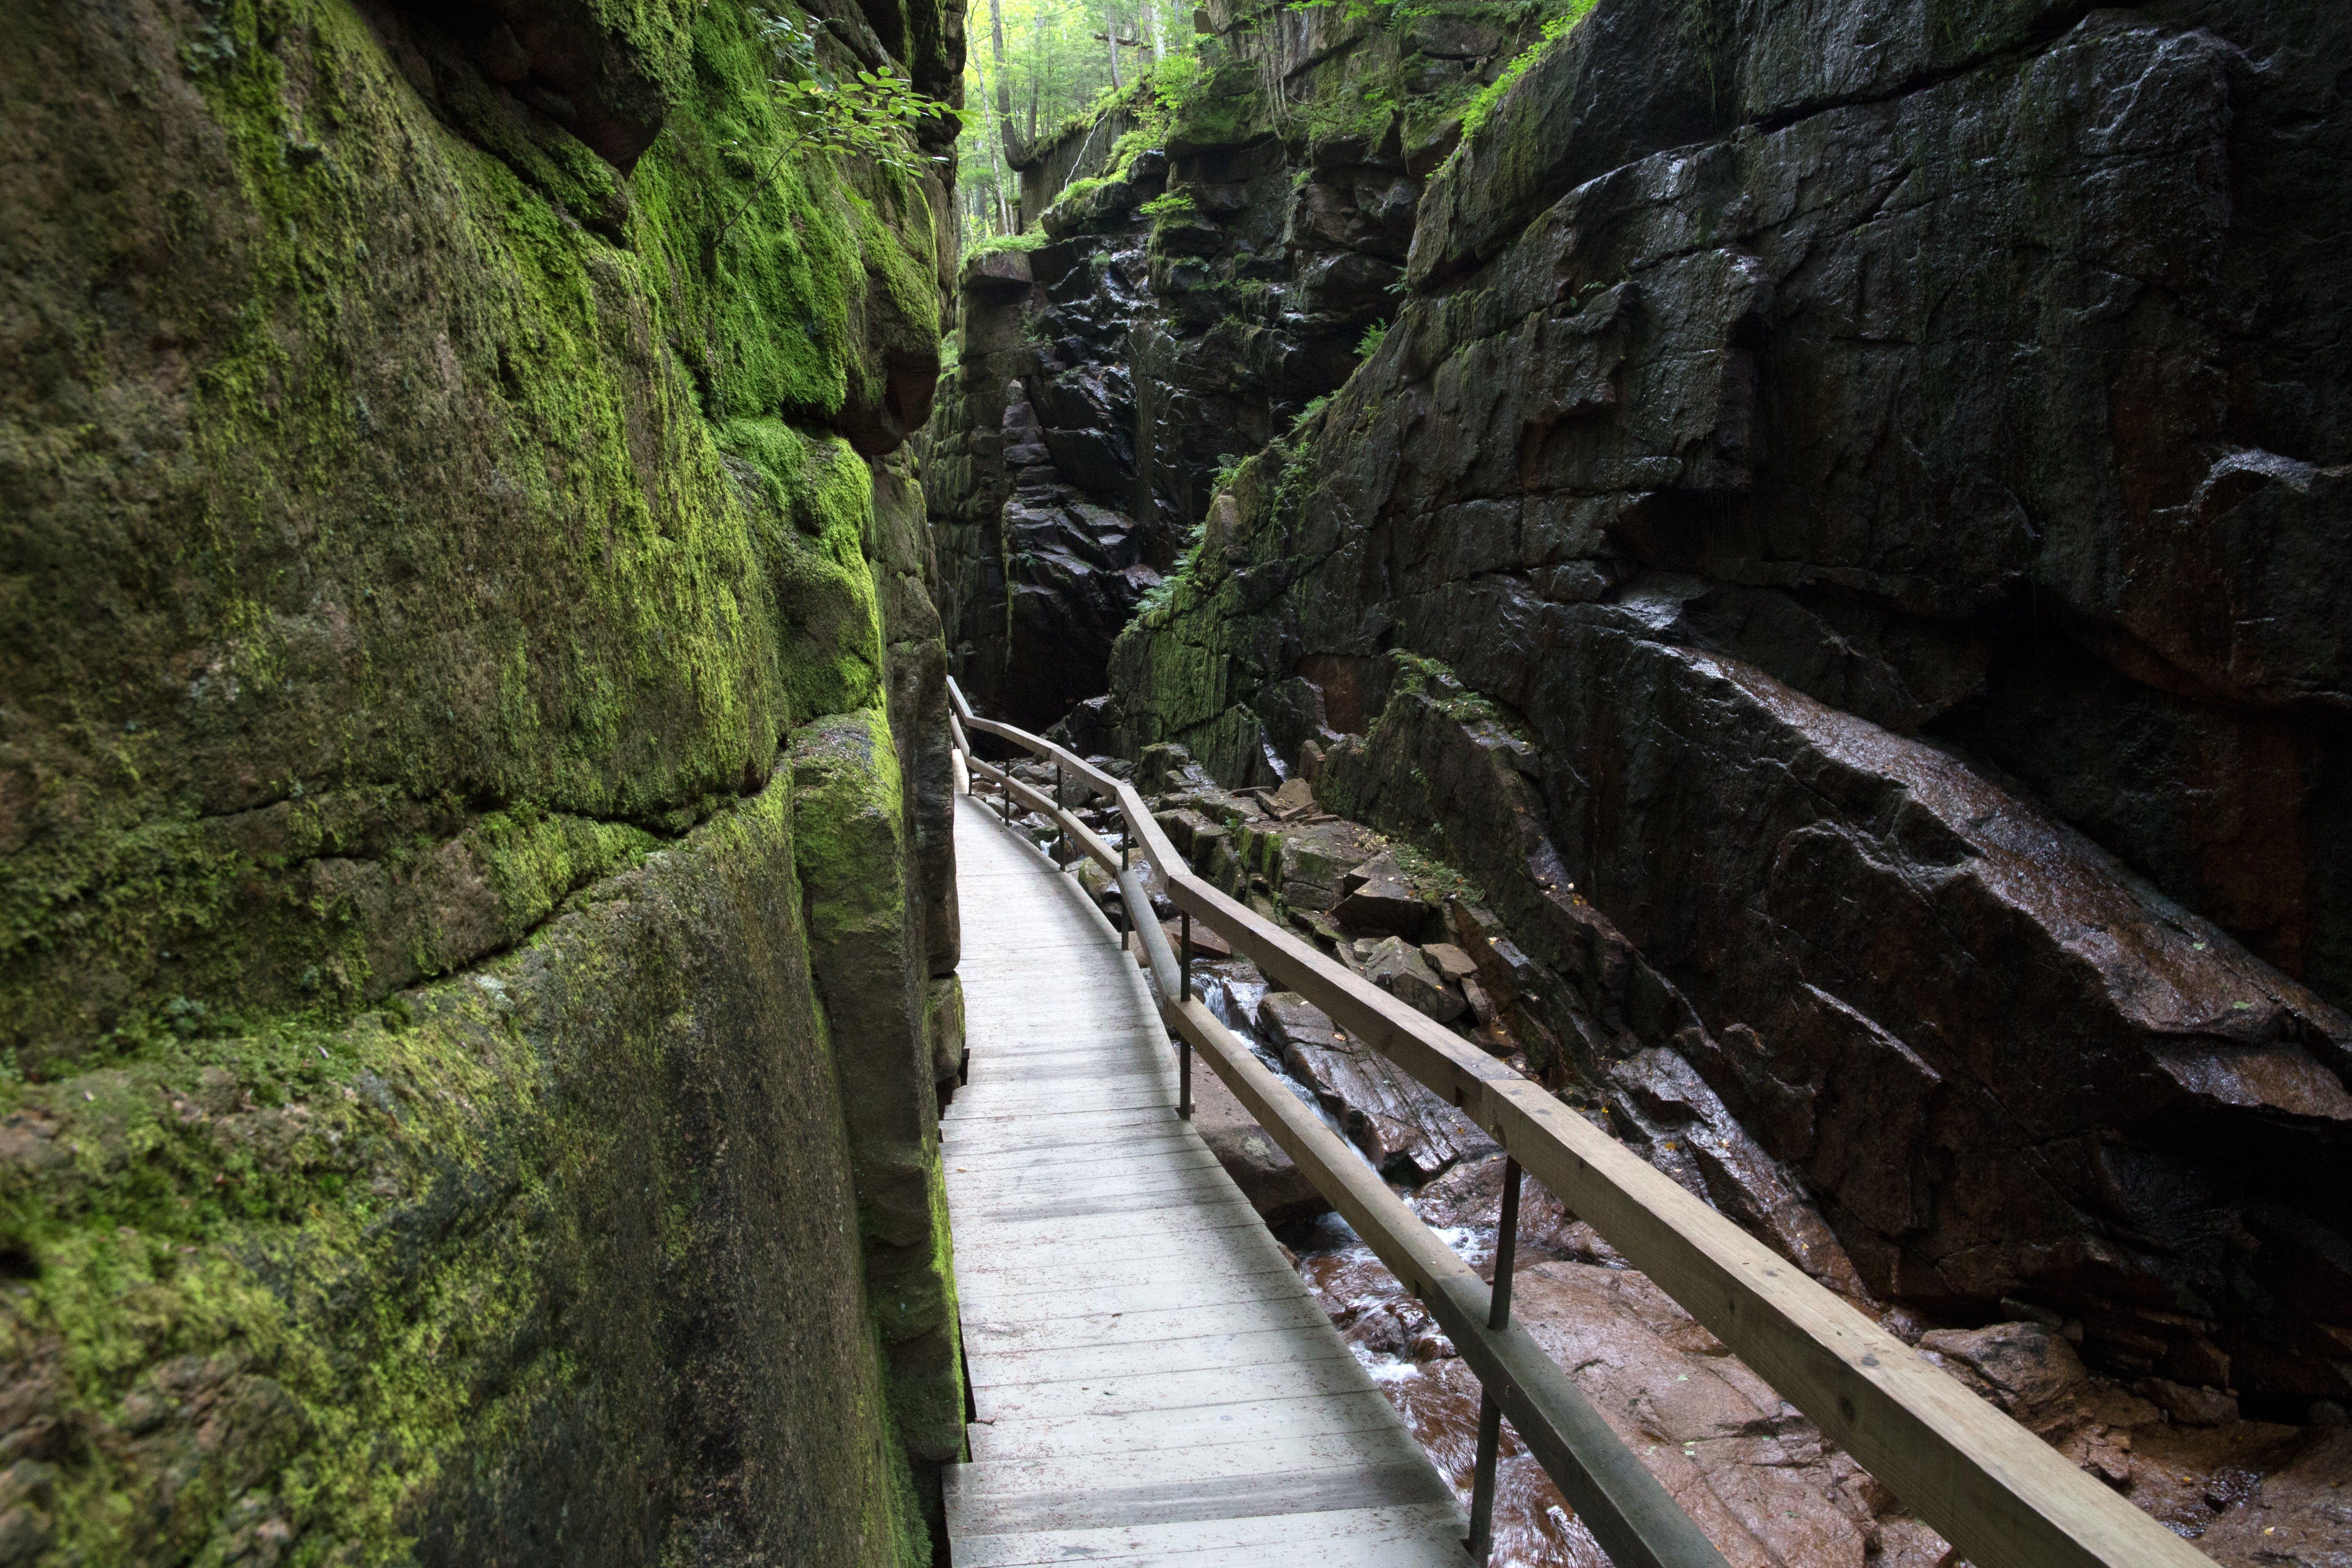 Gray Wooden Bridge Between Two Mossy Rock Formation